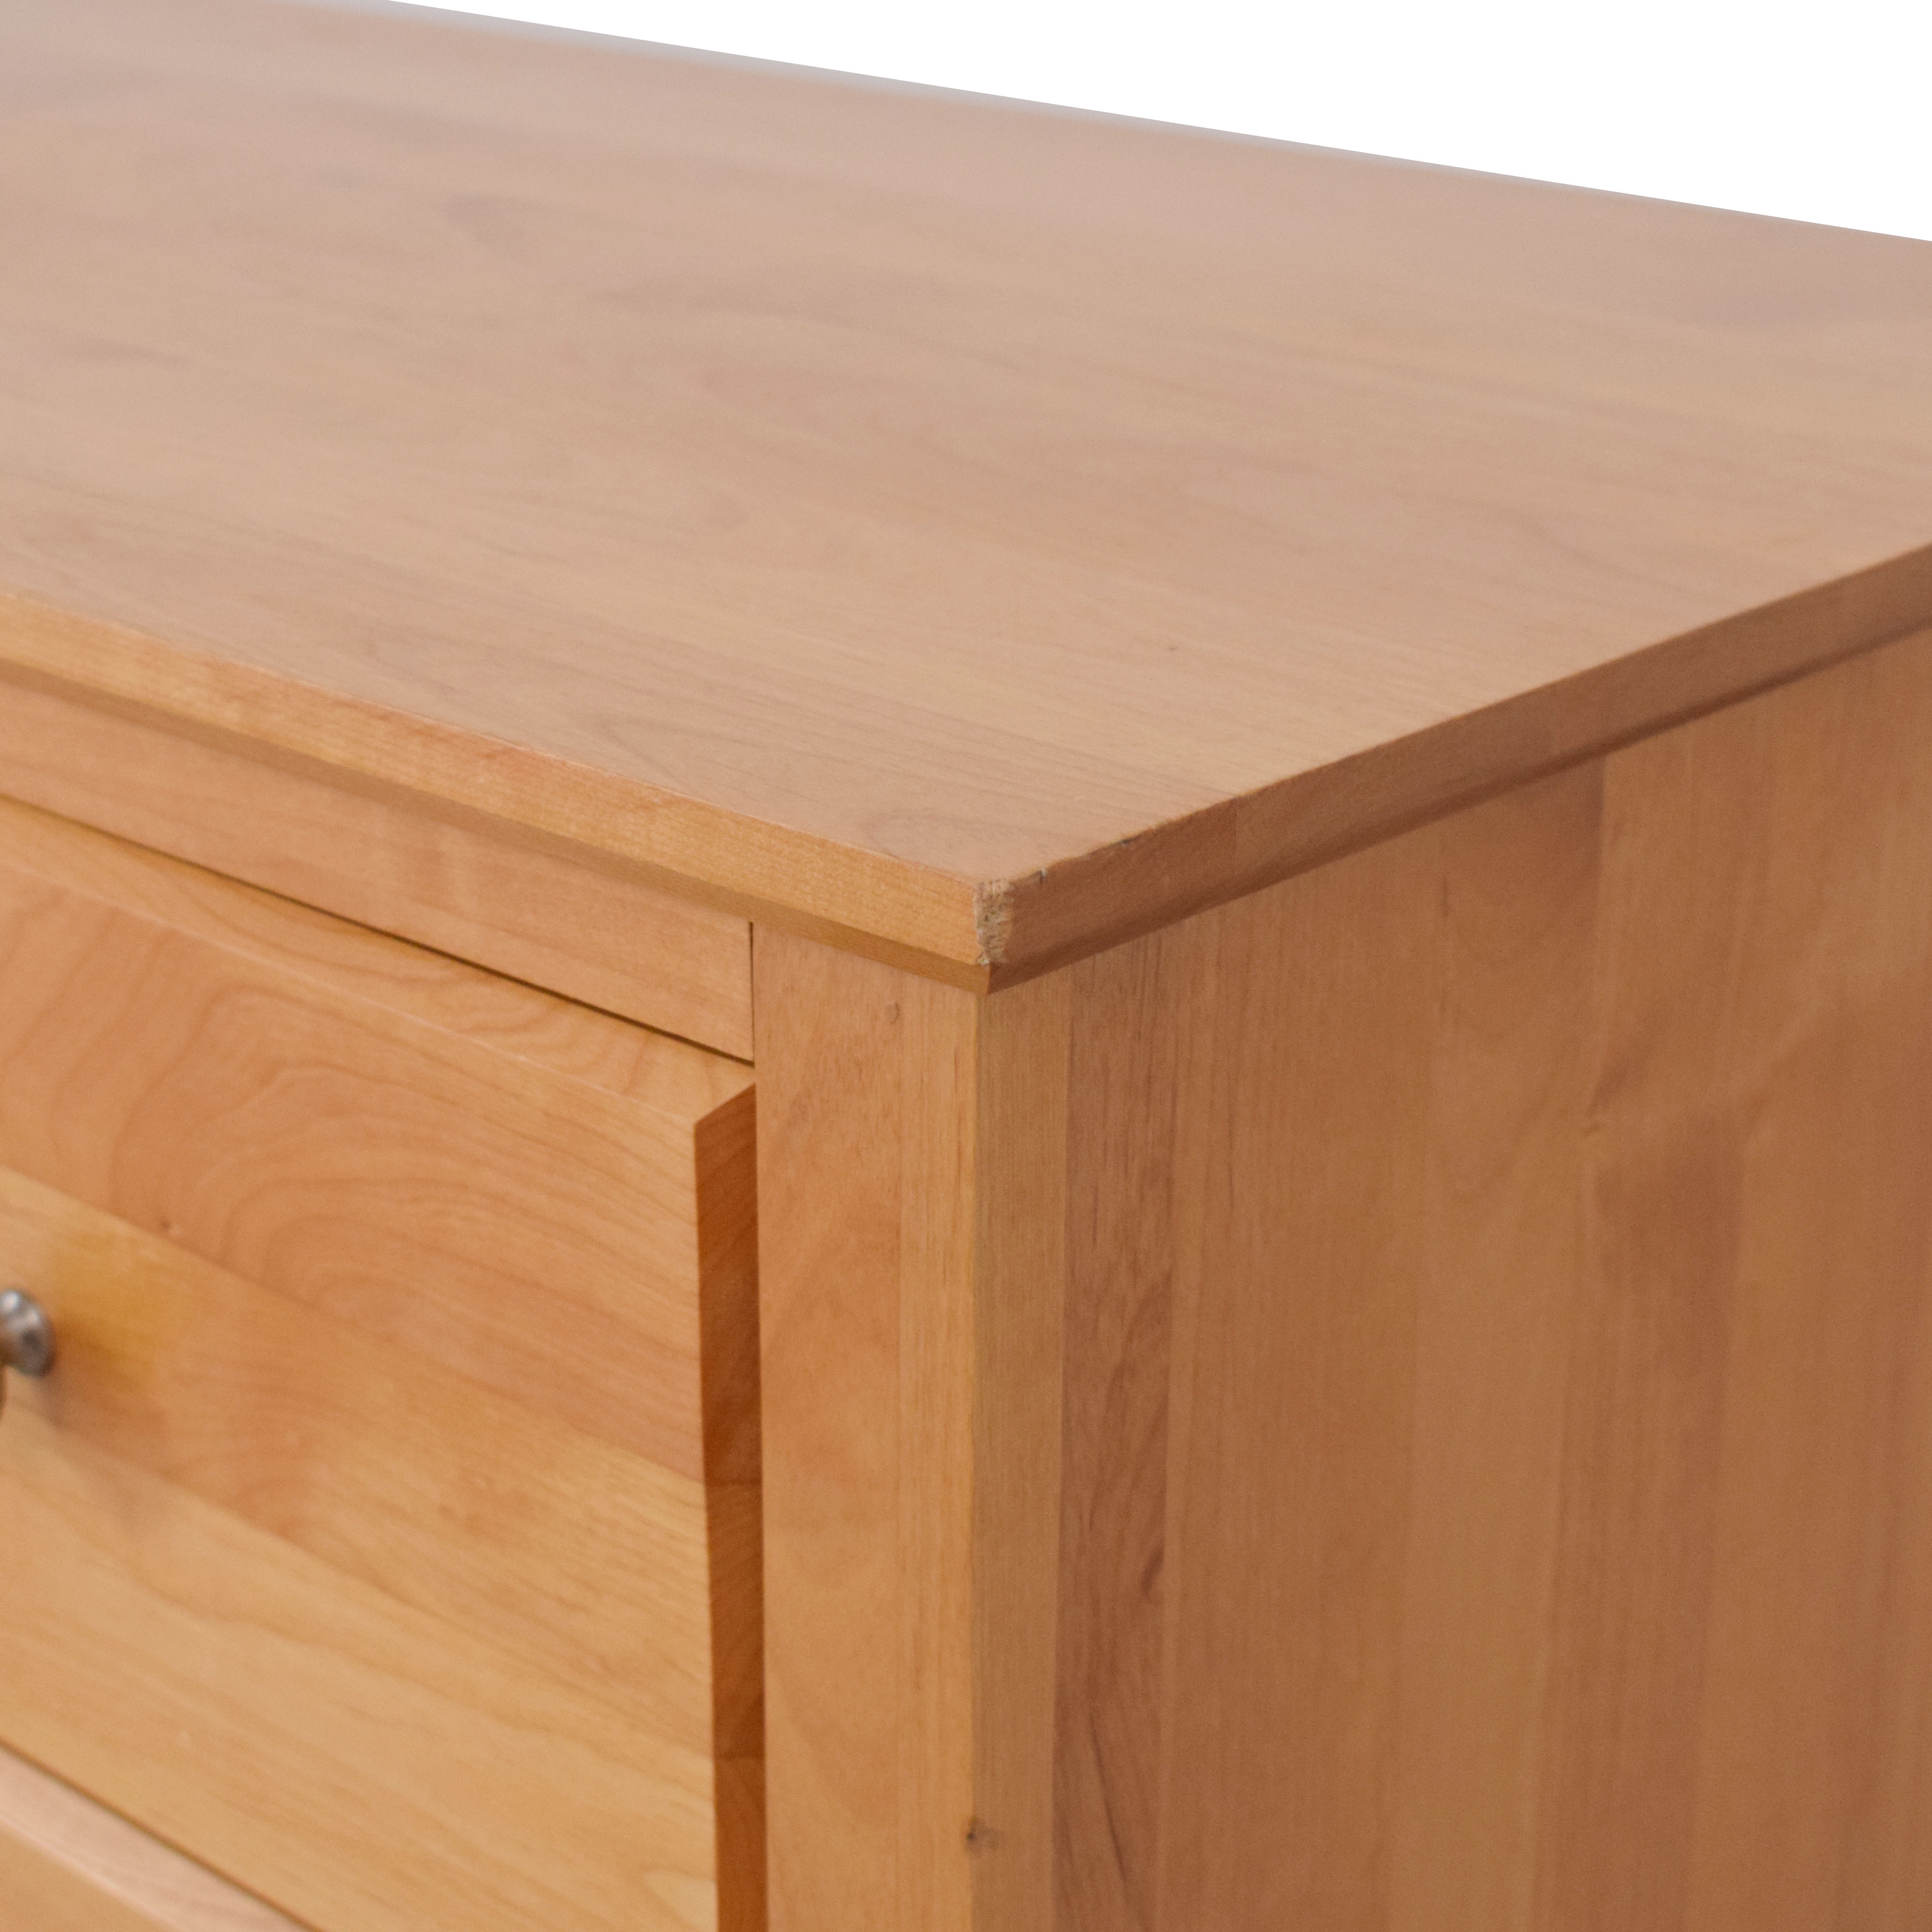 Maco Furniture Maco Furniture Dresser on sale